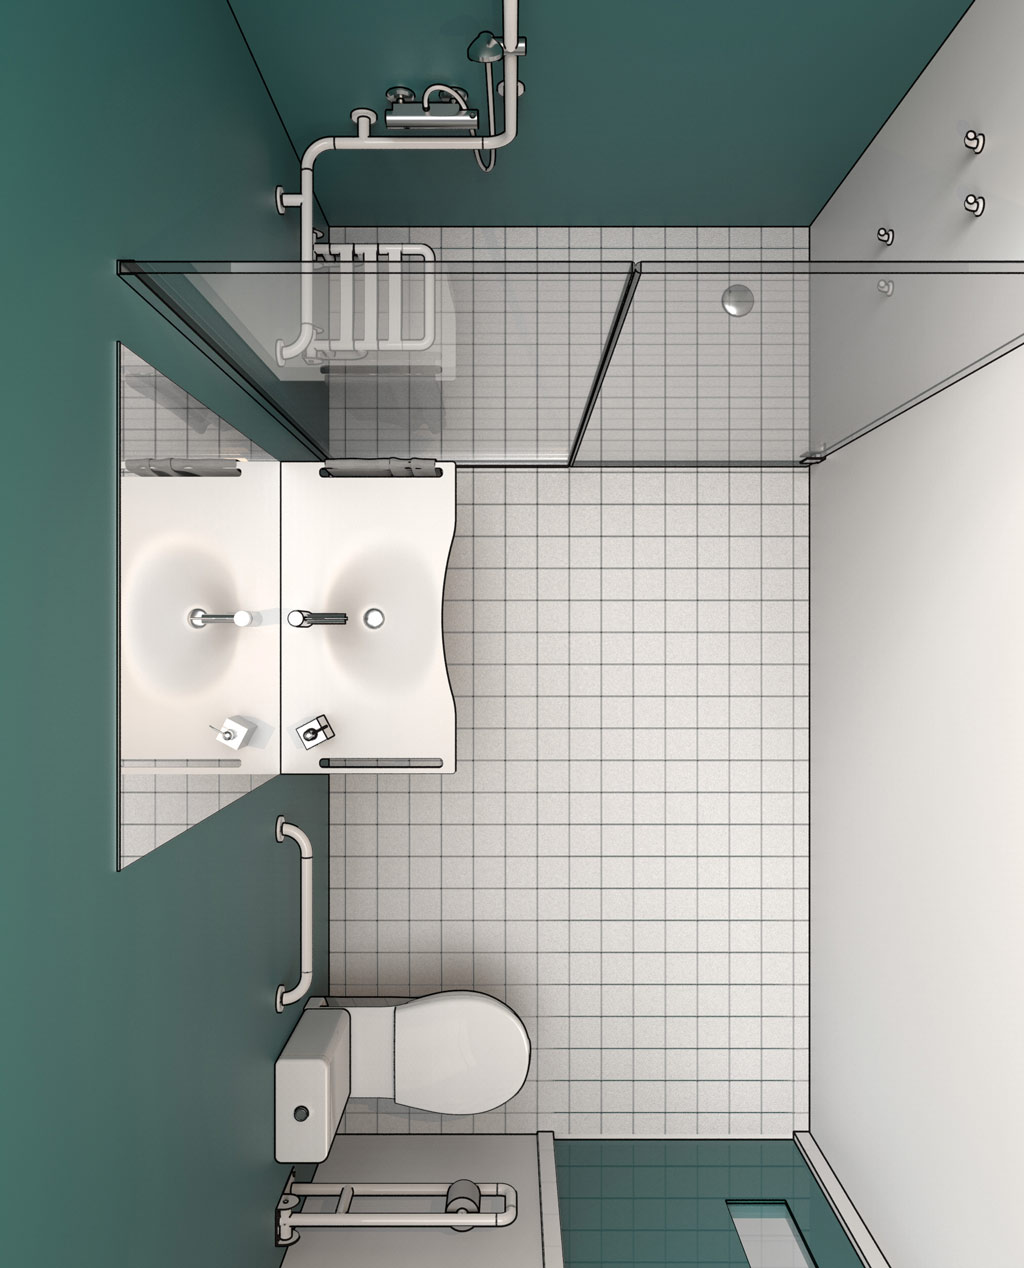 Progettazione dwg bagni disabili disegni in 3d - Bagno disabili dwg ...